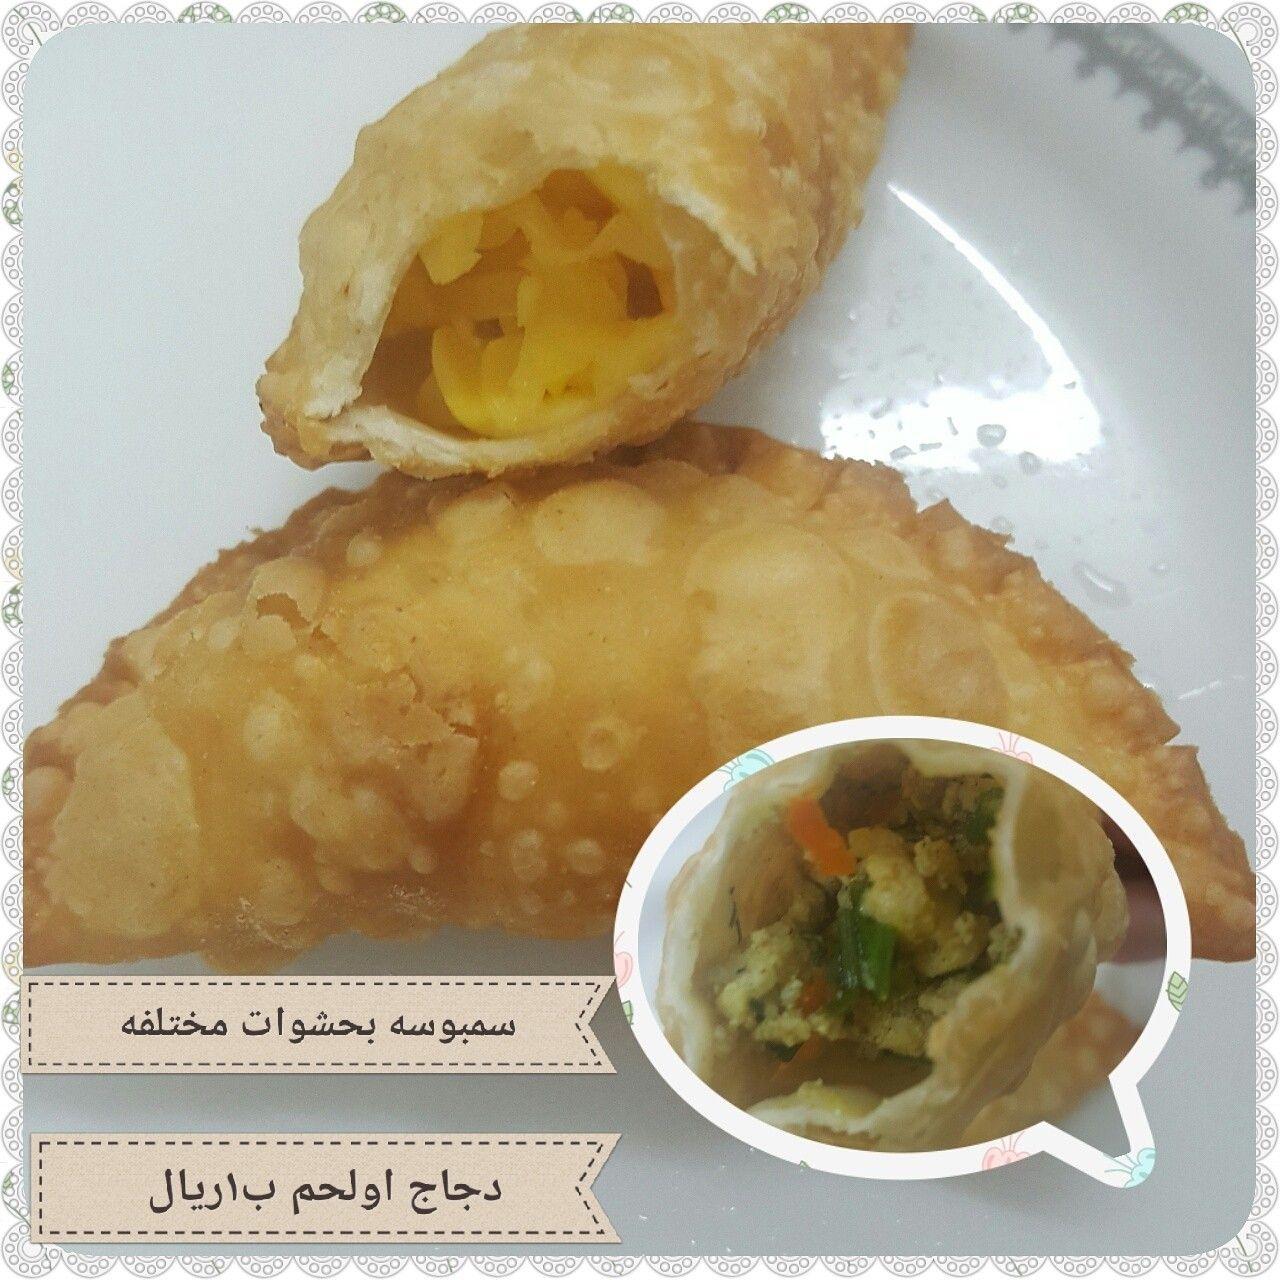 سبموسه خضار او دجاج او لحم او جبنه بيضاء او صفراء حشوات متنوعه Food Fruit Cantaloupe